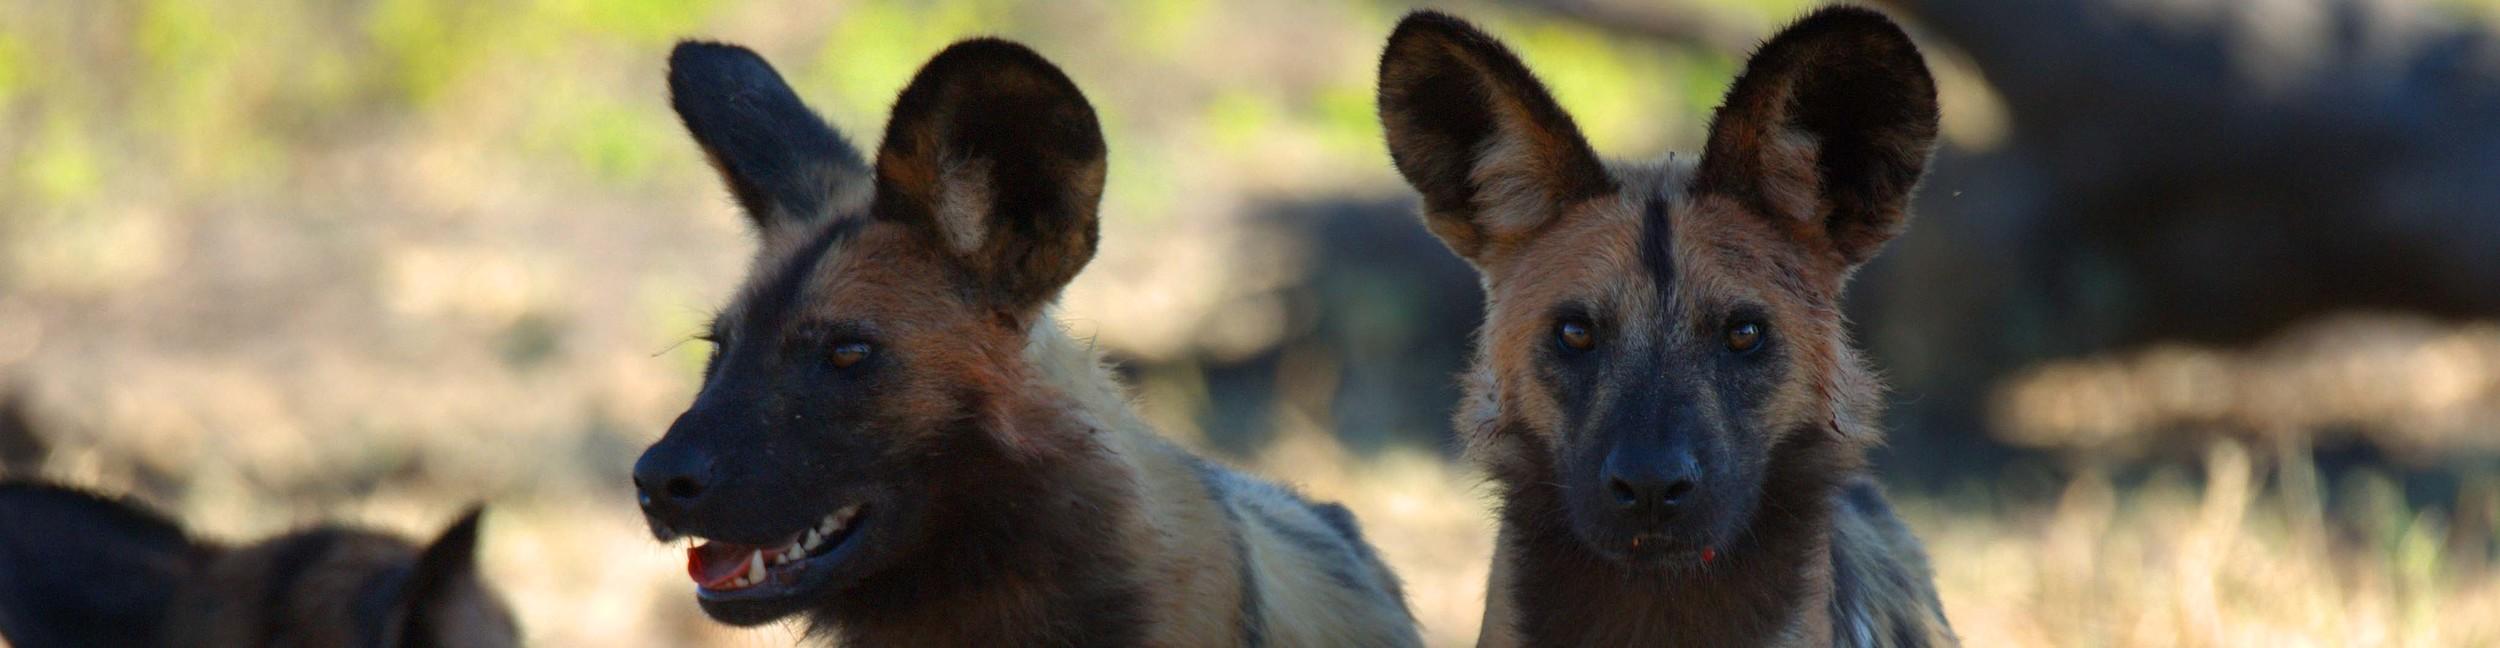 Botswana Banner strip Wild Dogs.jpg